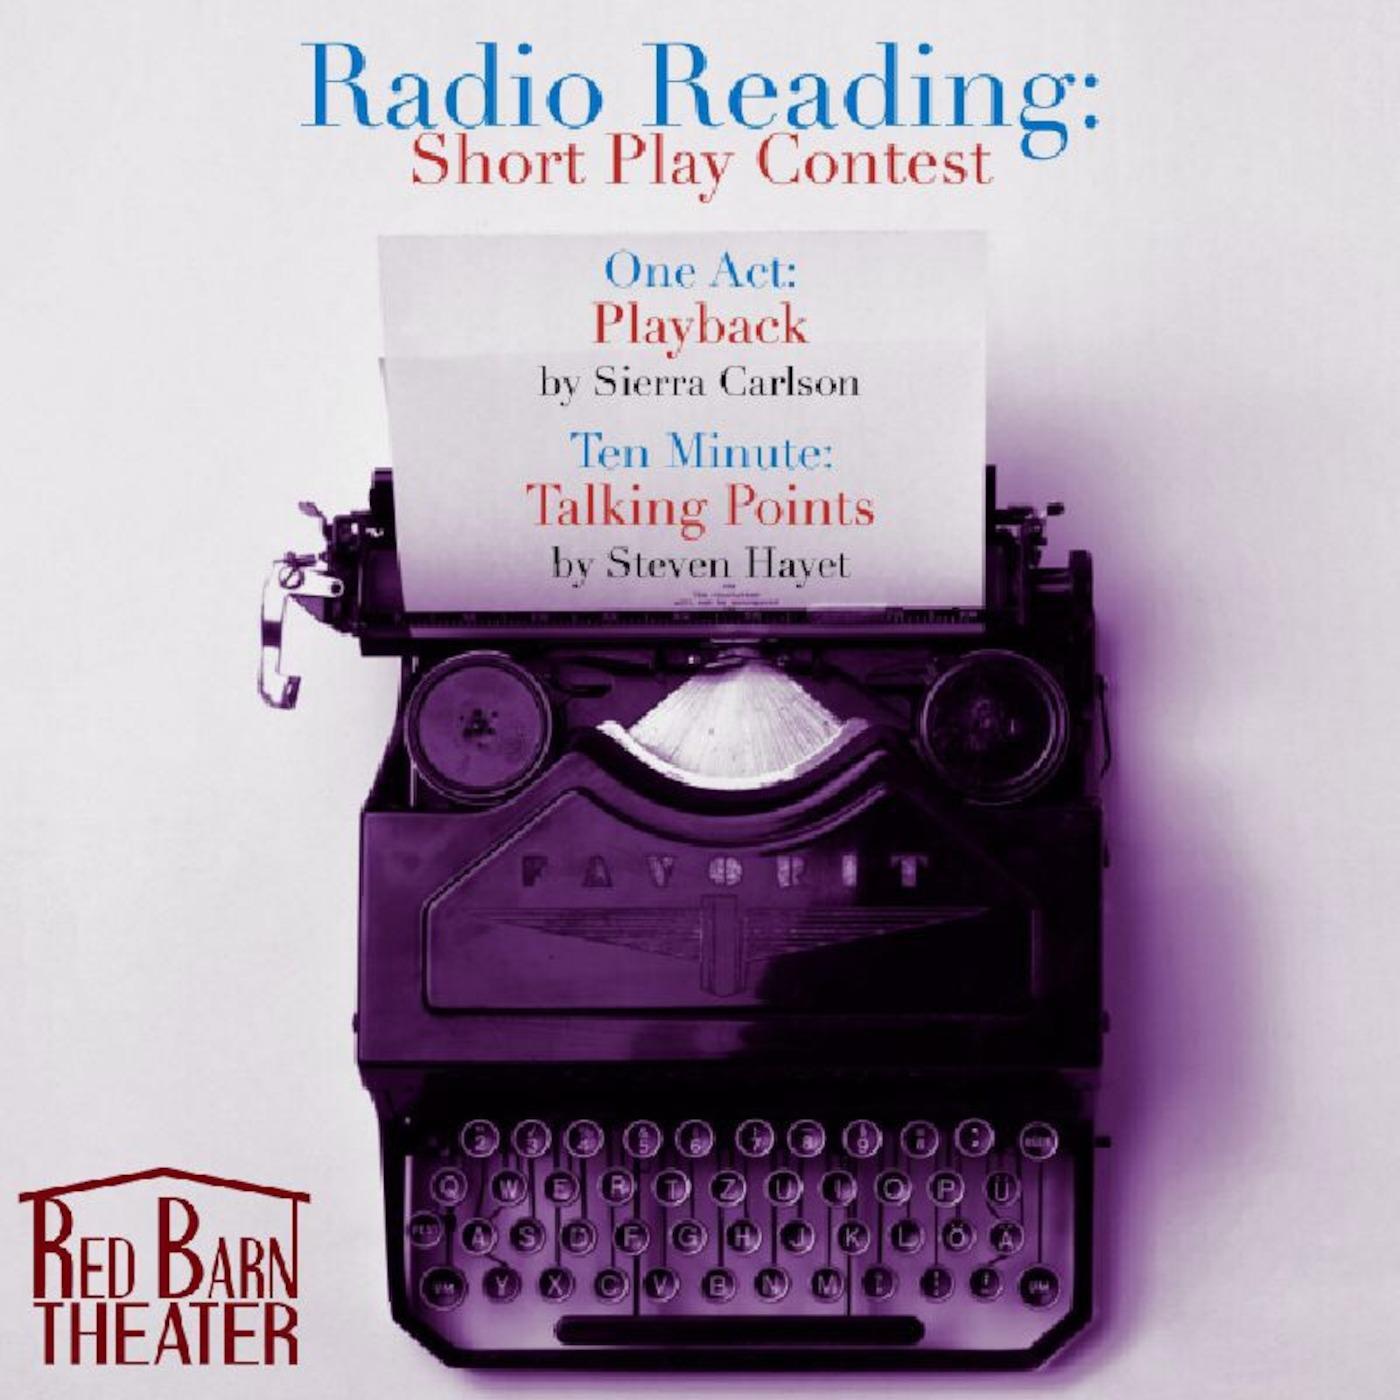 Red Barn Radio Reading: Short Play Contest